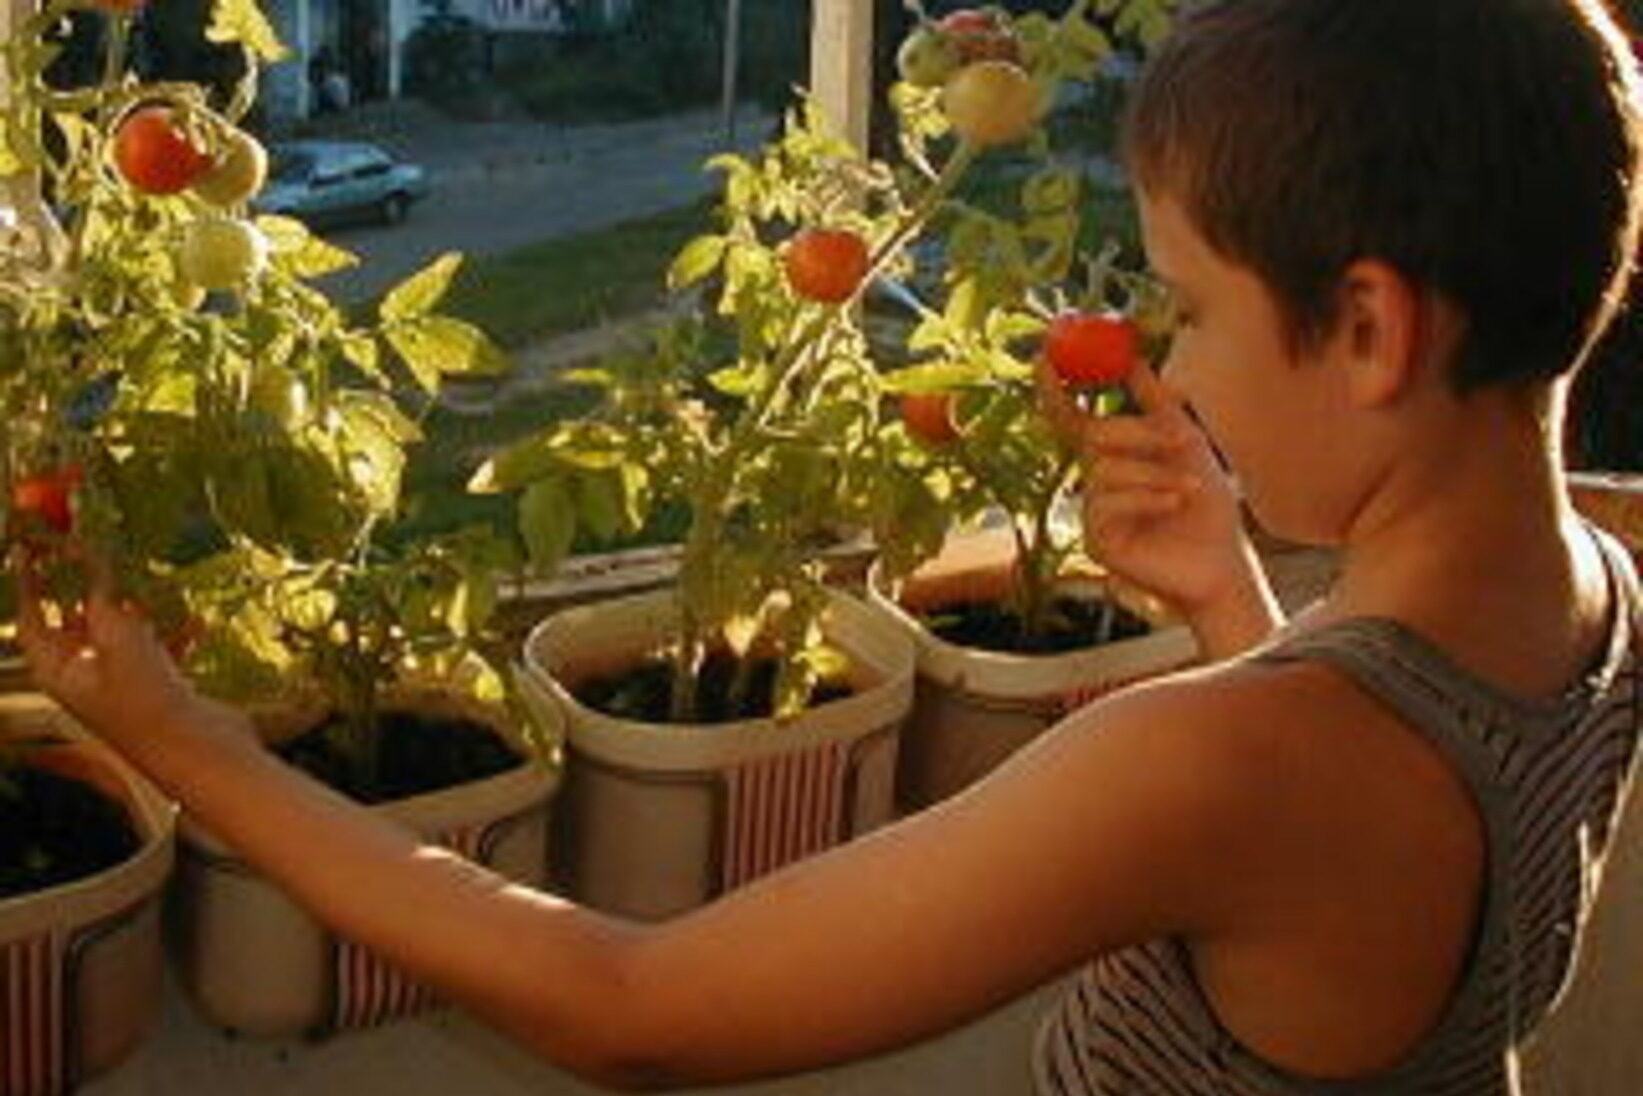 приучить ребенка к труду садоводство на балконе